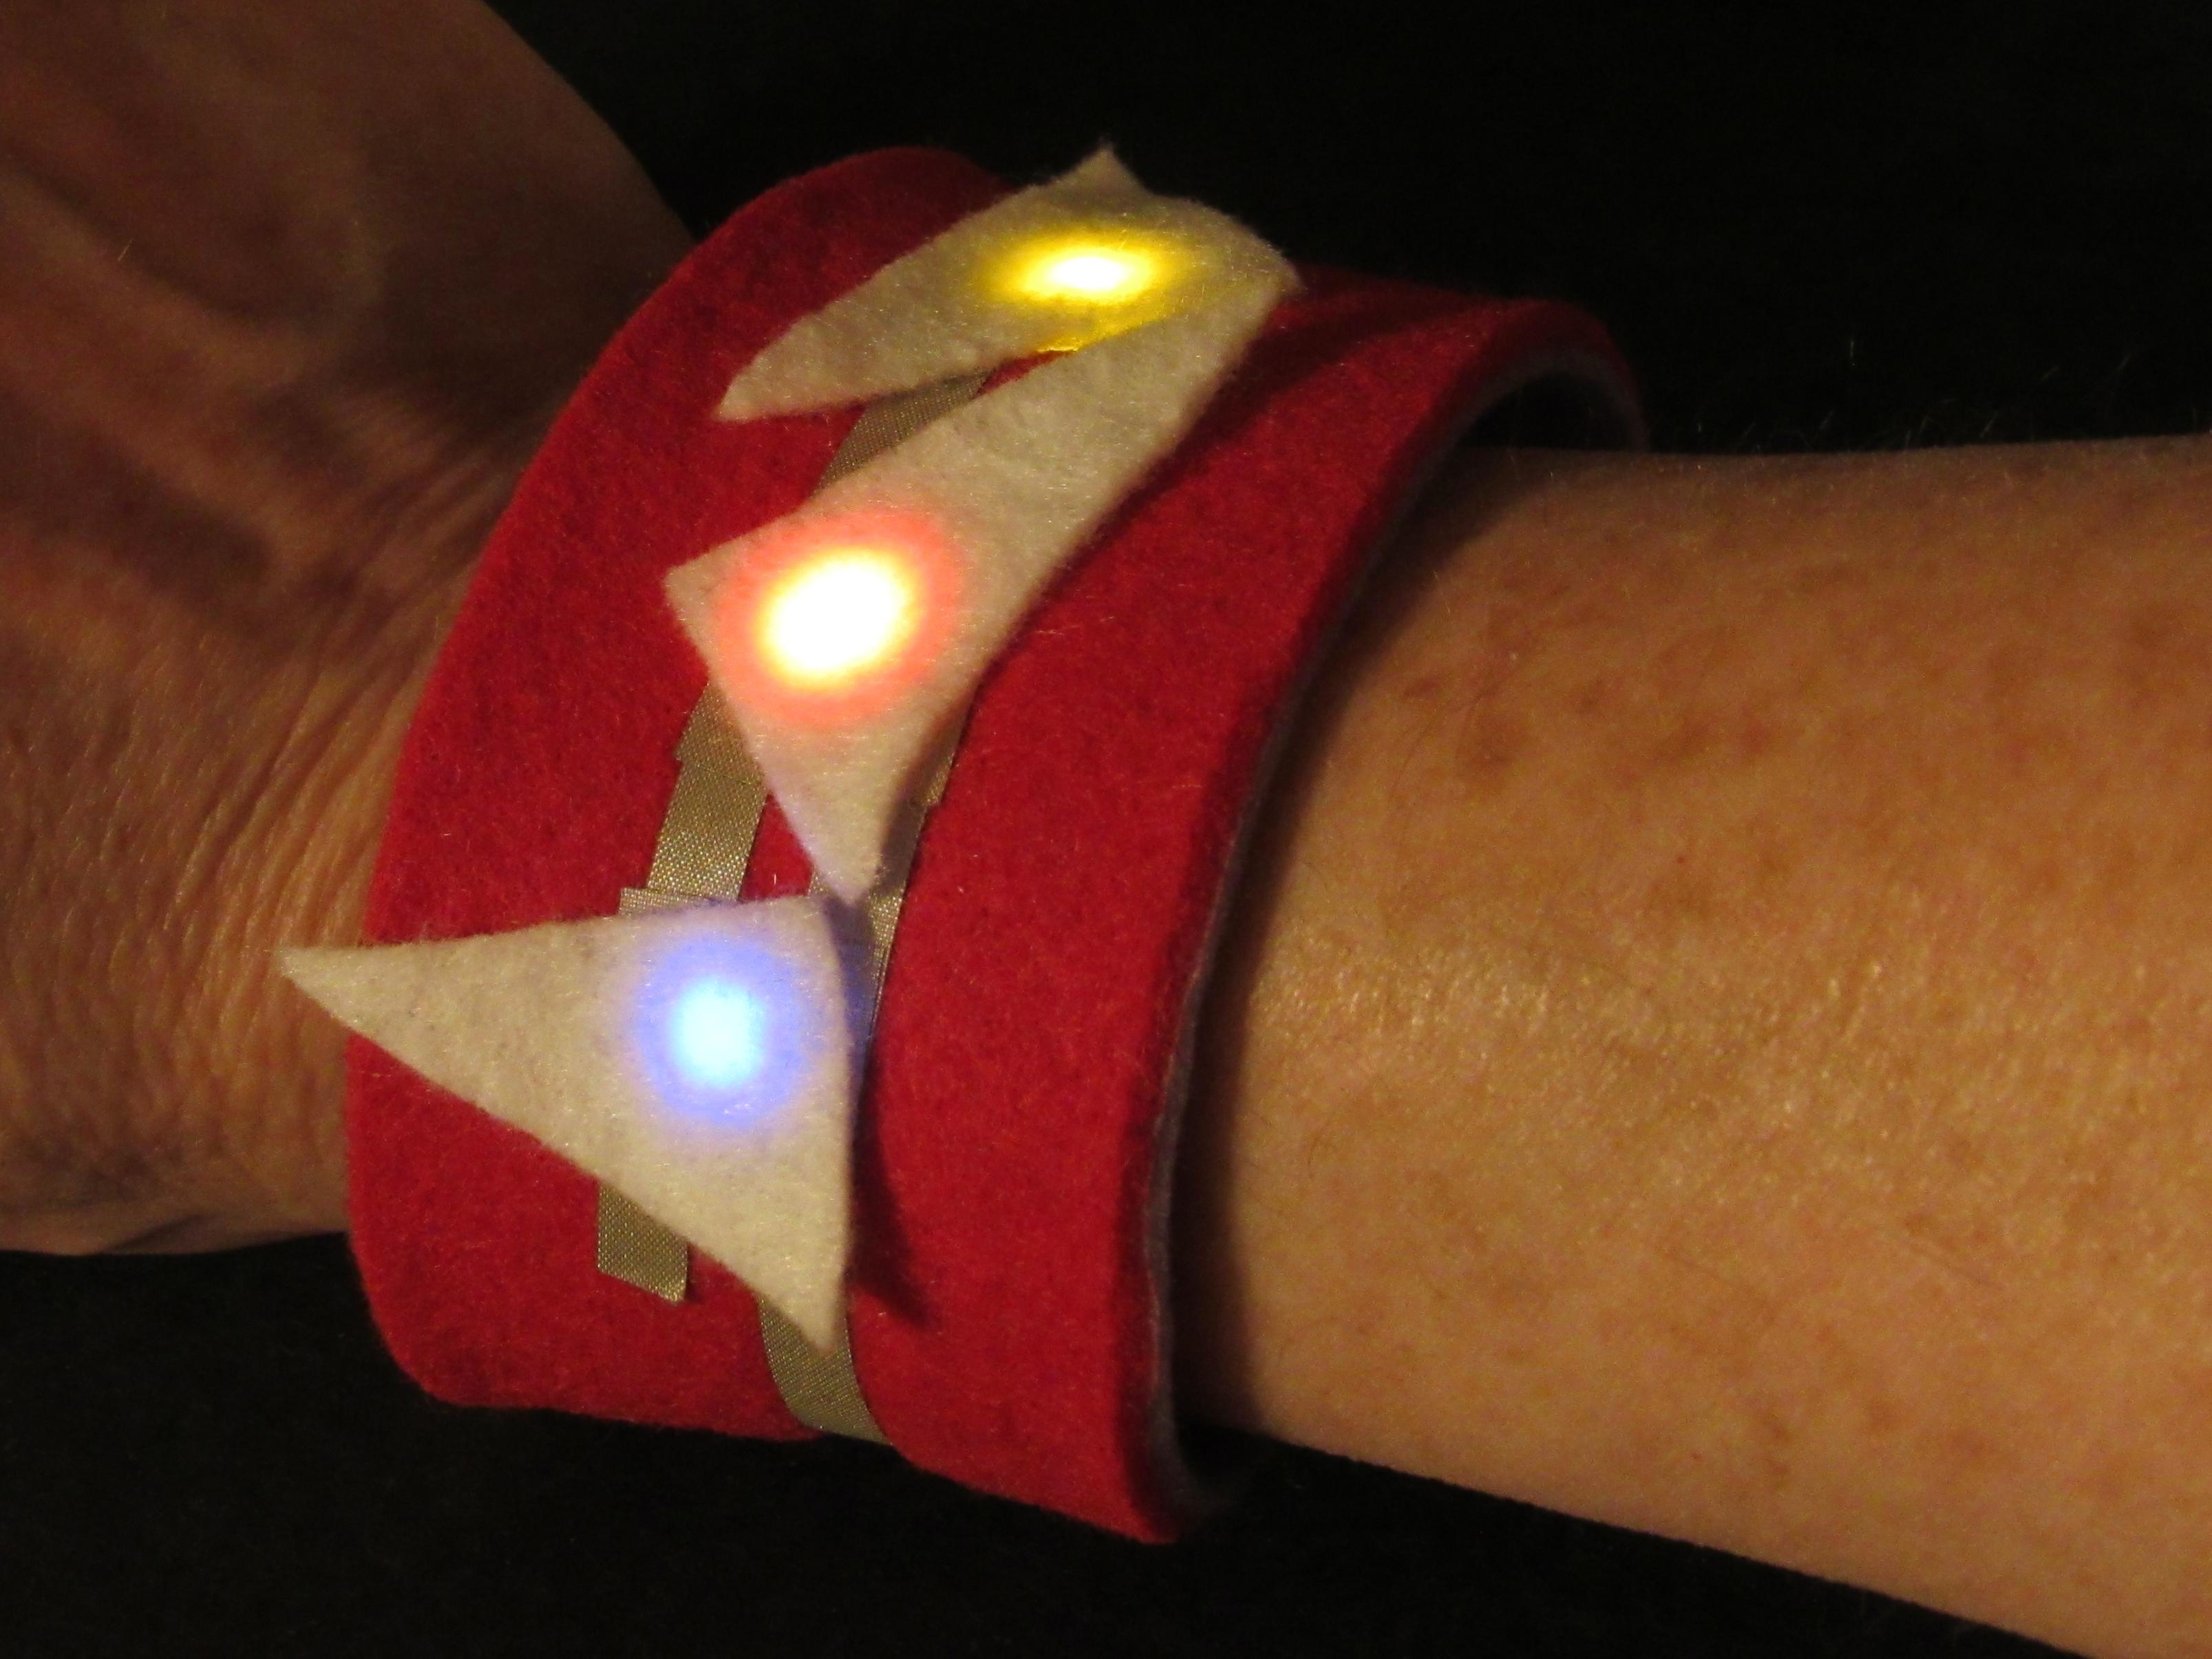 leds_0-Red_on_Wrist.jpg